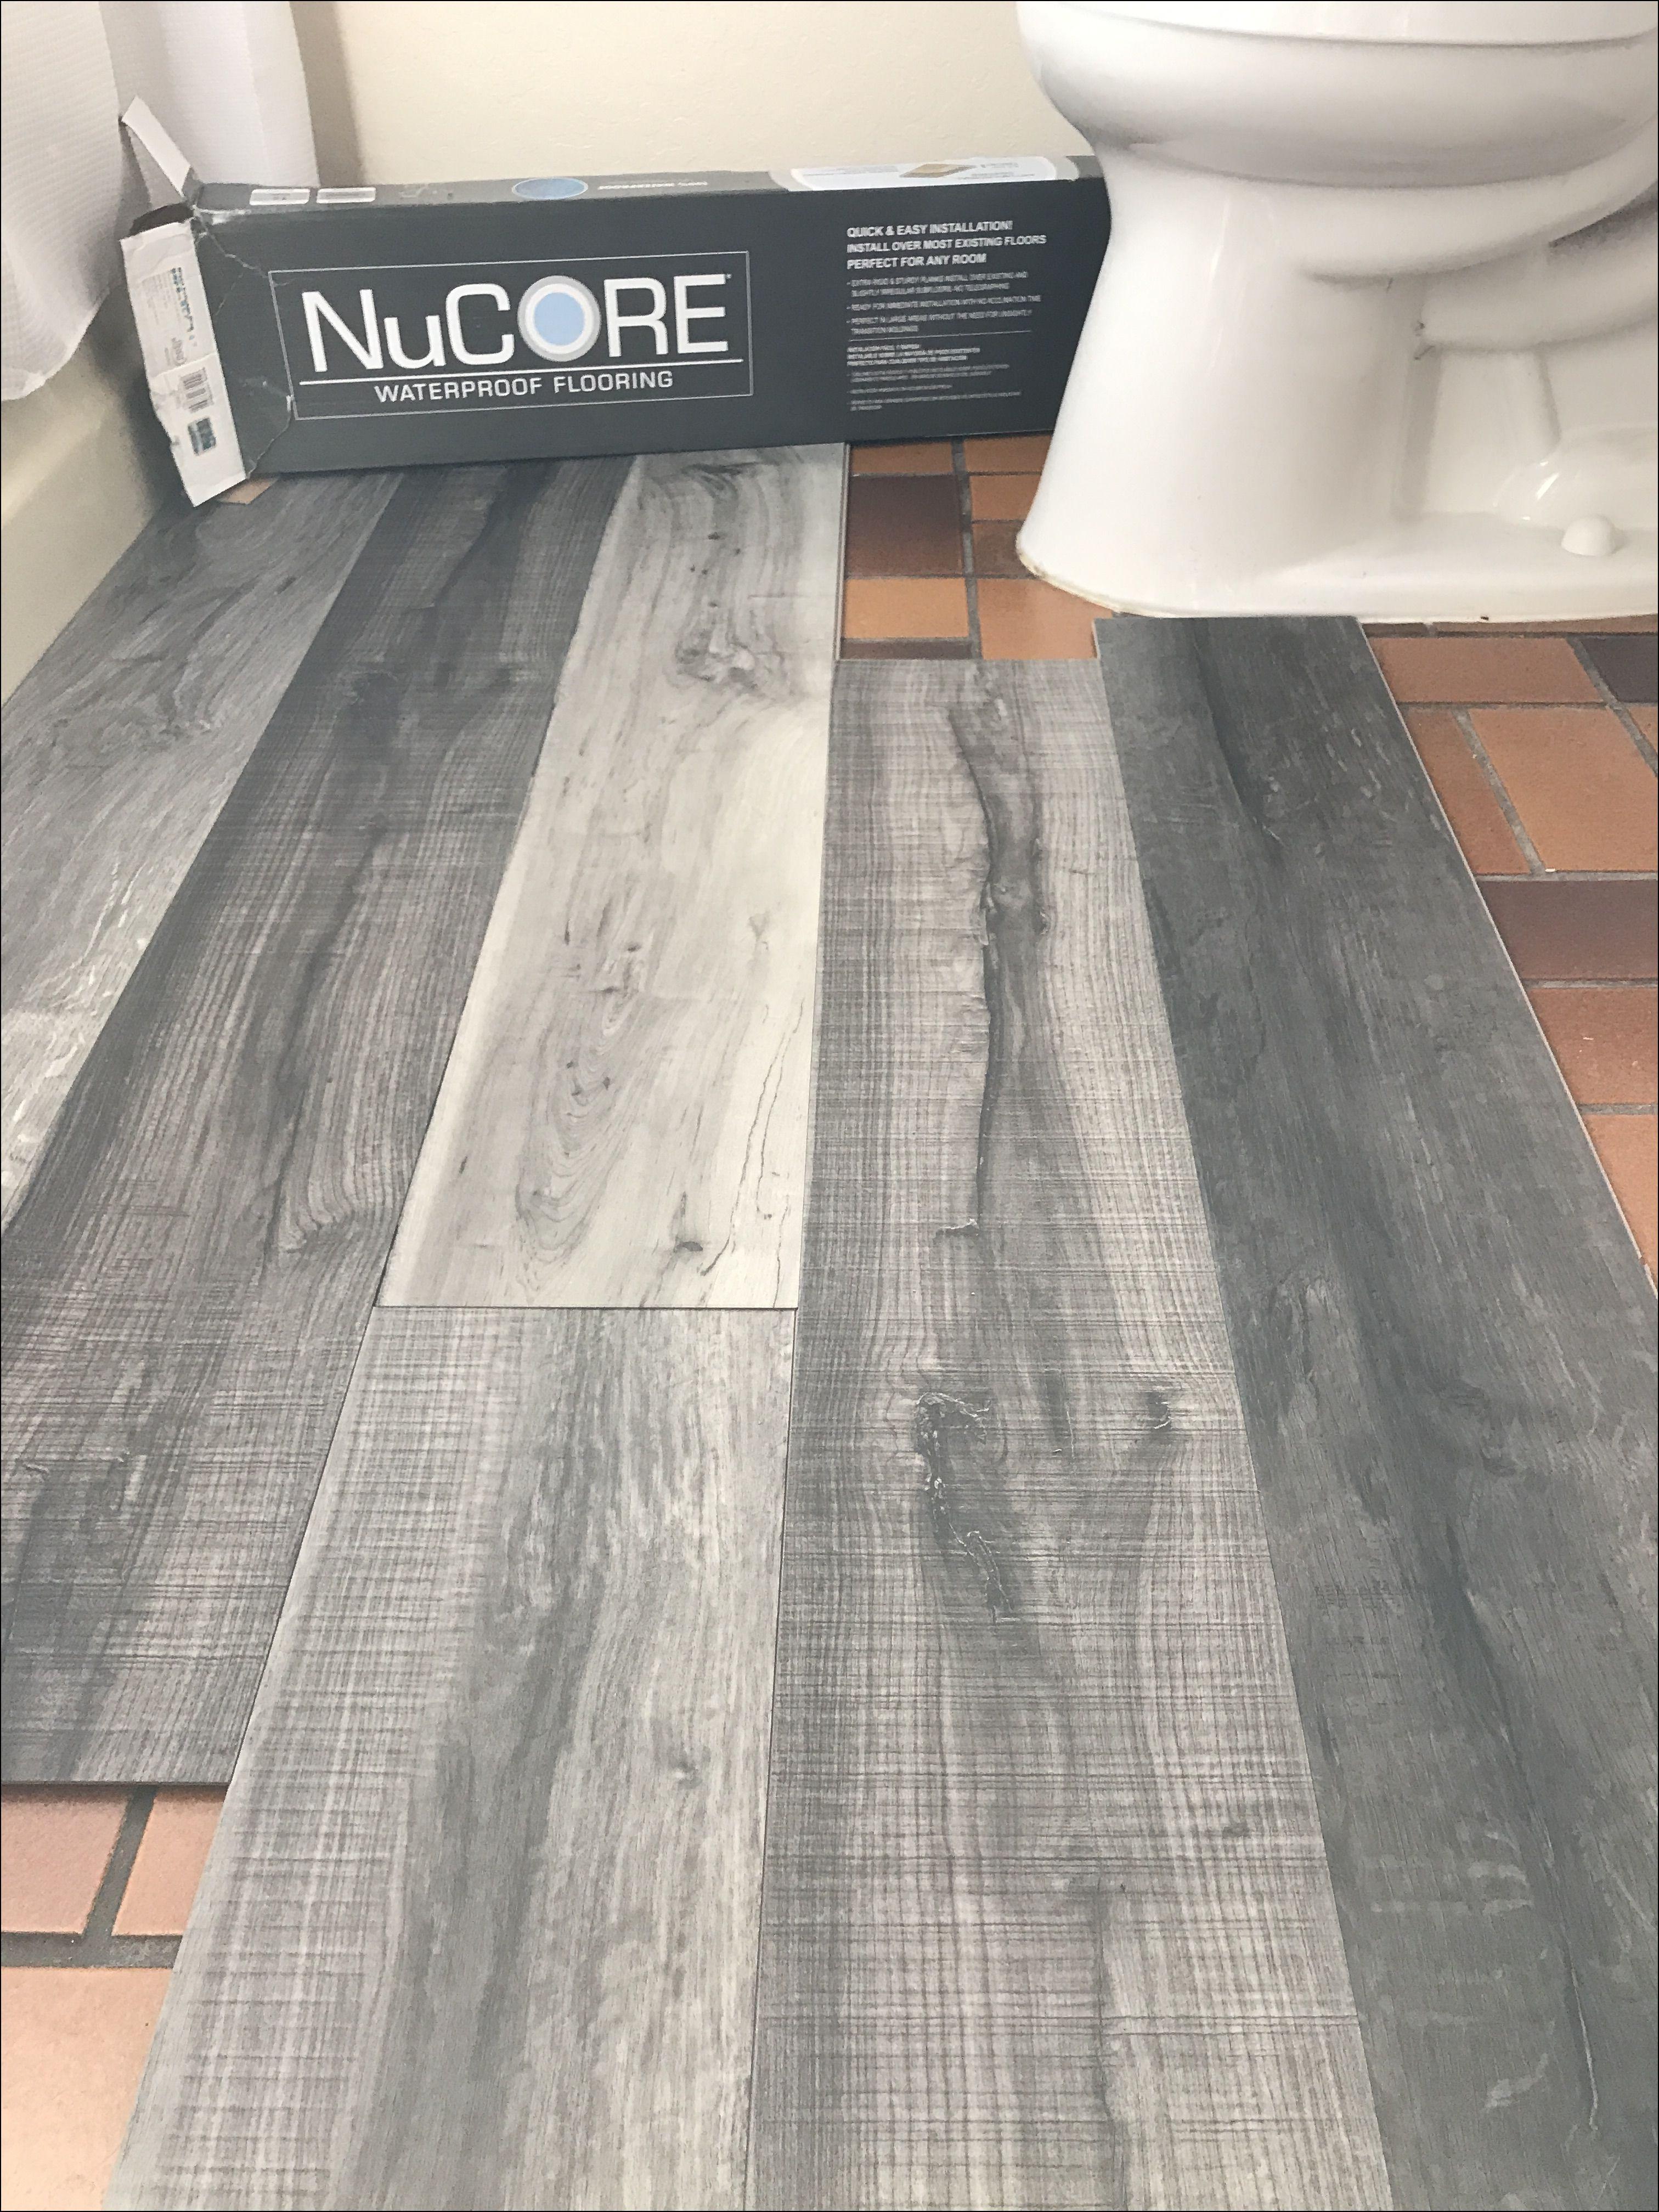 waterproof hardwood flooring home depot of home depot queen creek flooring ideas in home depot vinyl plank flooring waterproof galerie vinyl plank flooring that s waterproof lays right on